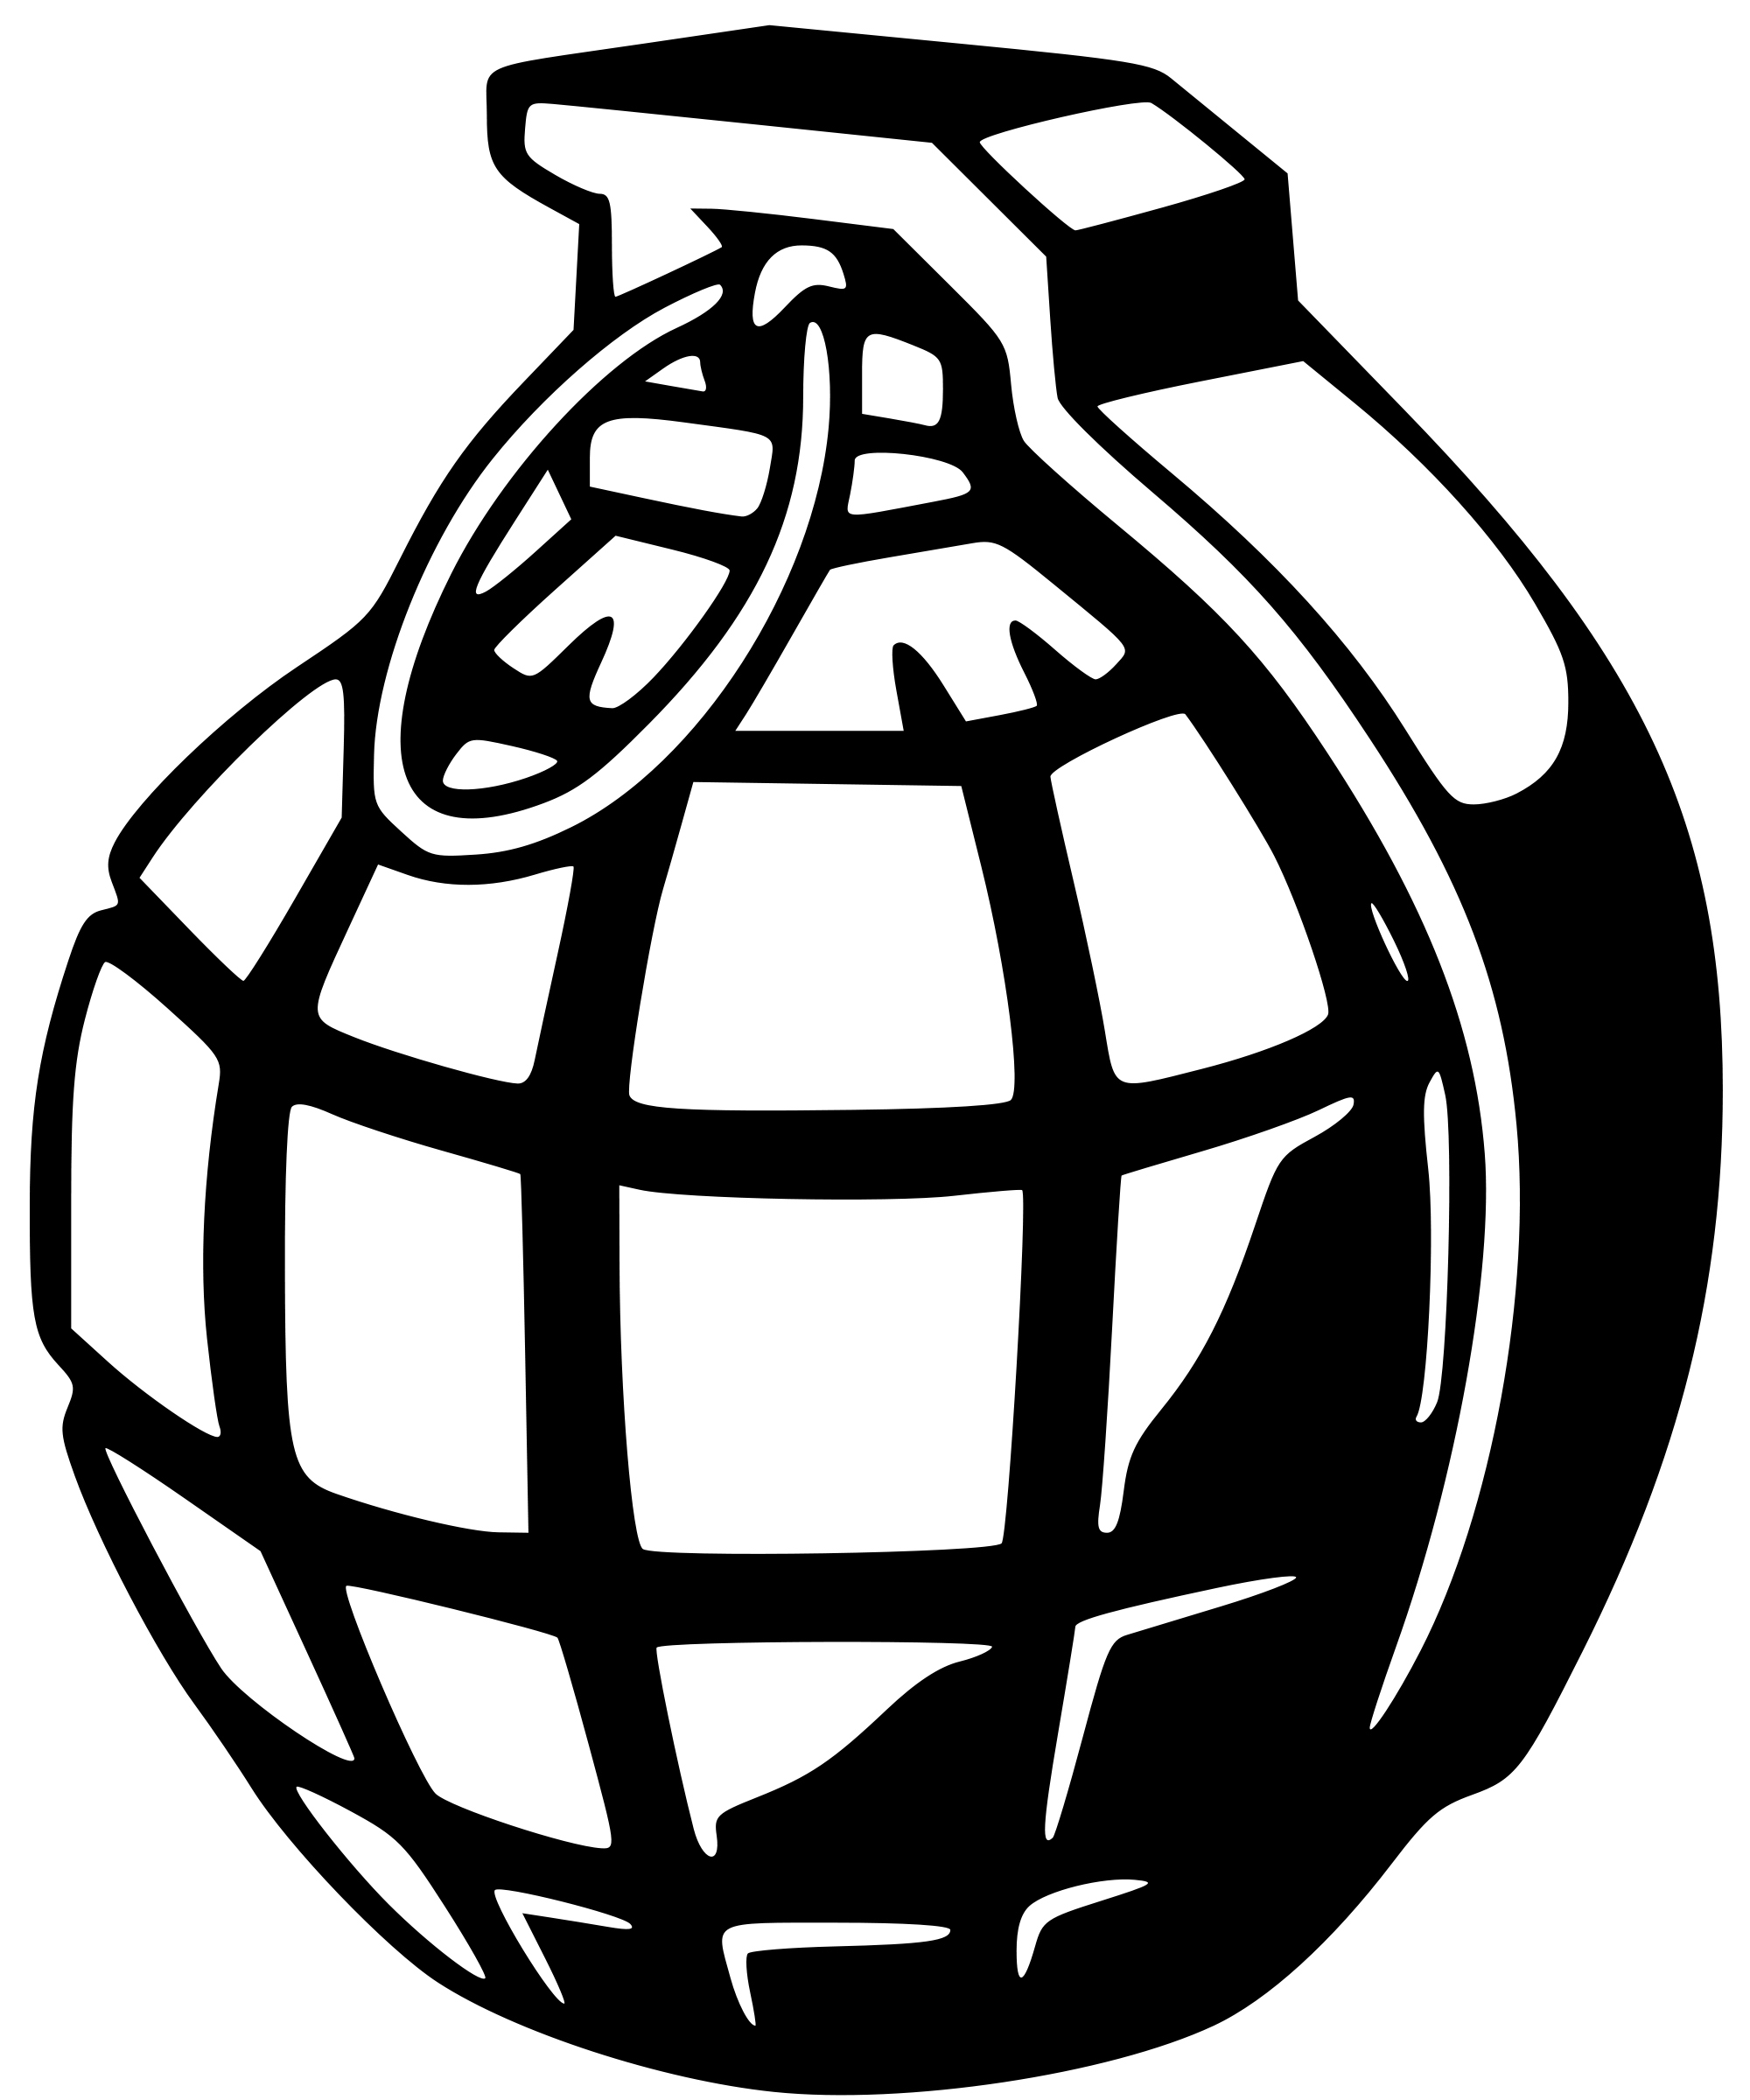 Pumpkin cut open clipart black and white clip stock File:Hand grenade.svg - Wikimedia Commons clip stock